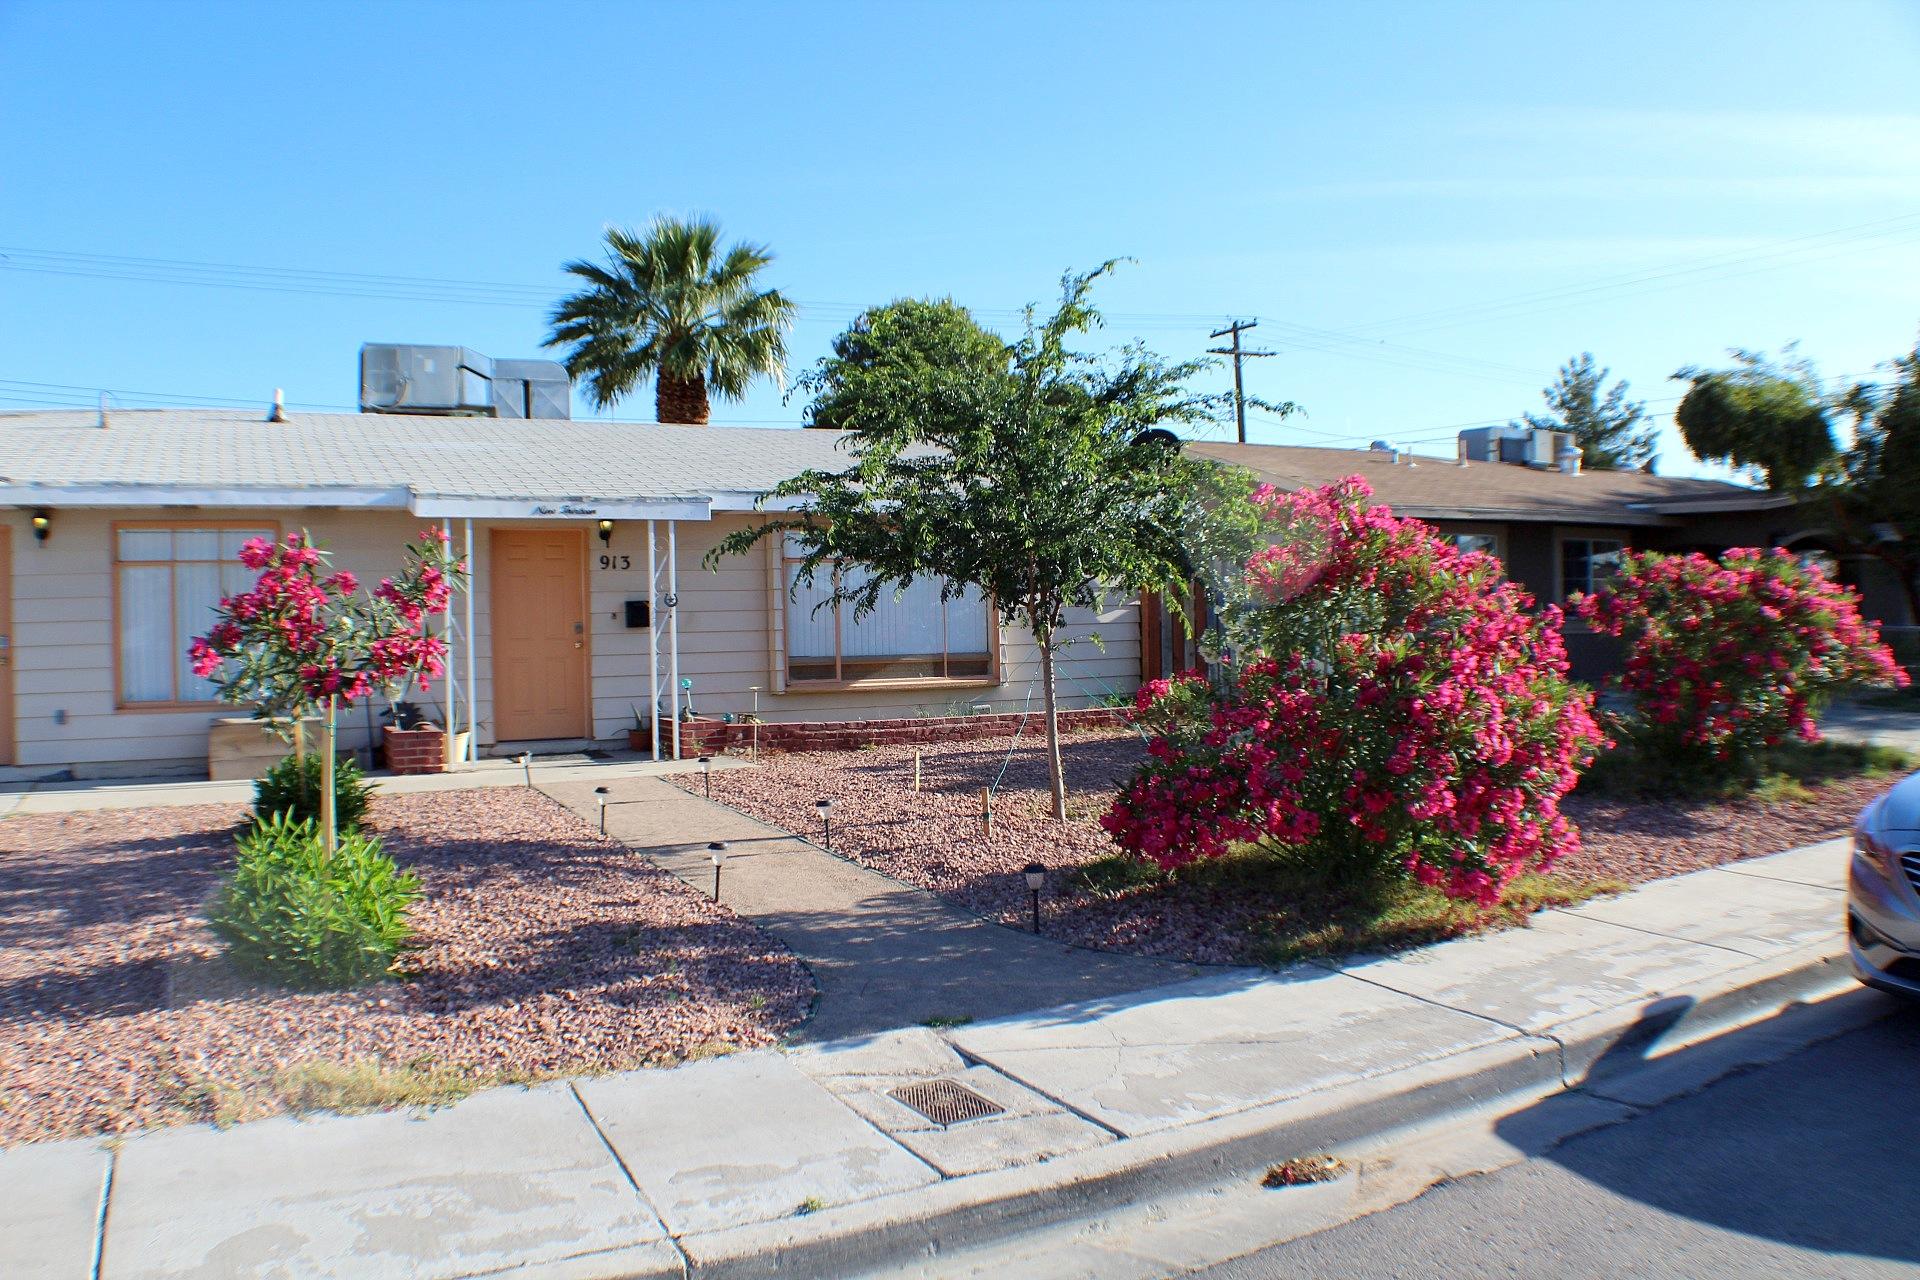 4 Bedrooms / 1.5 Bathrooms - Est. $1,401.00 / Month* for rent in North Las Vegas, NV